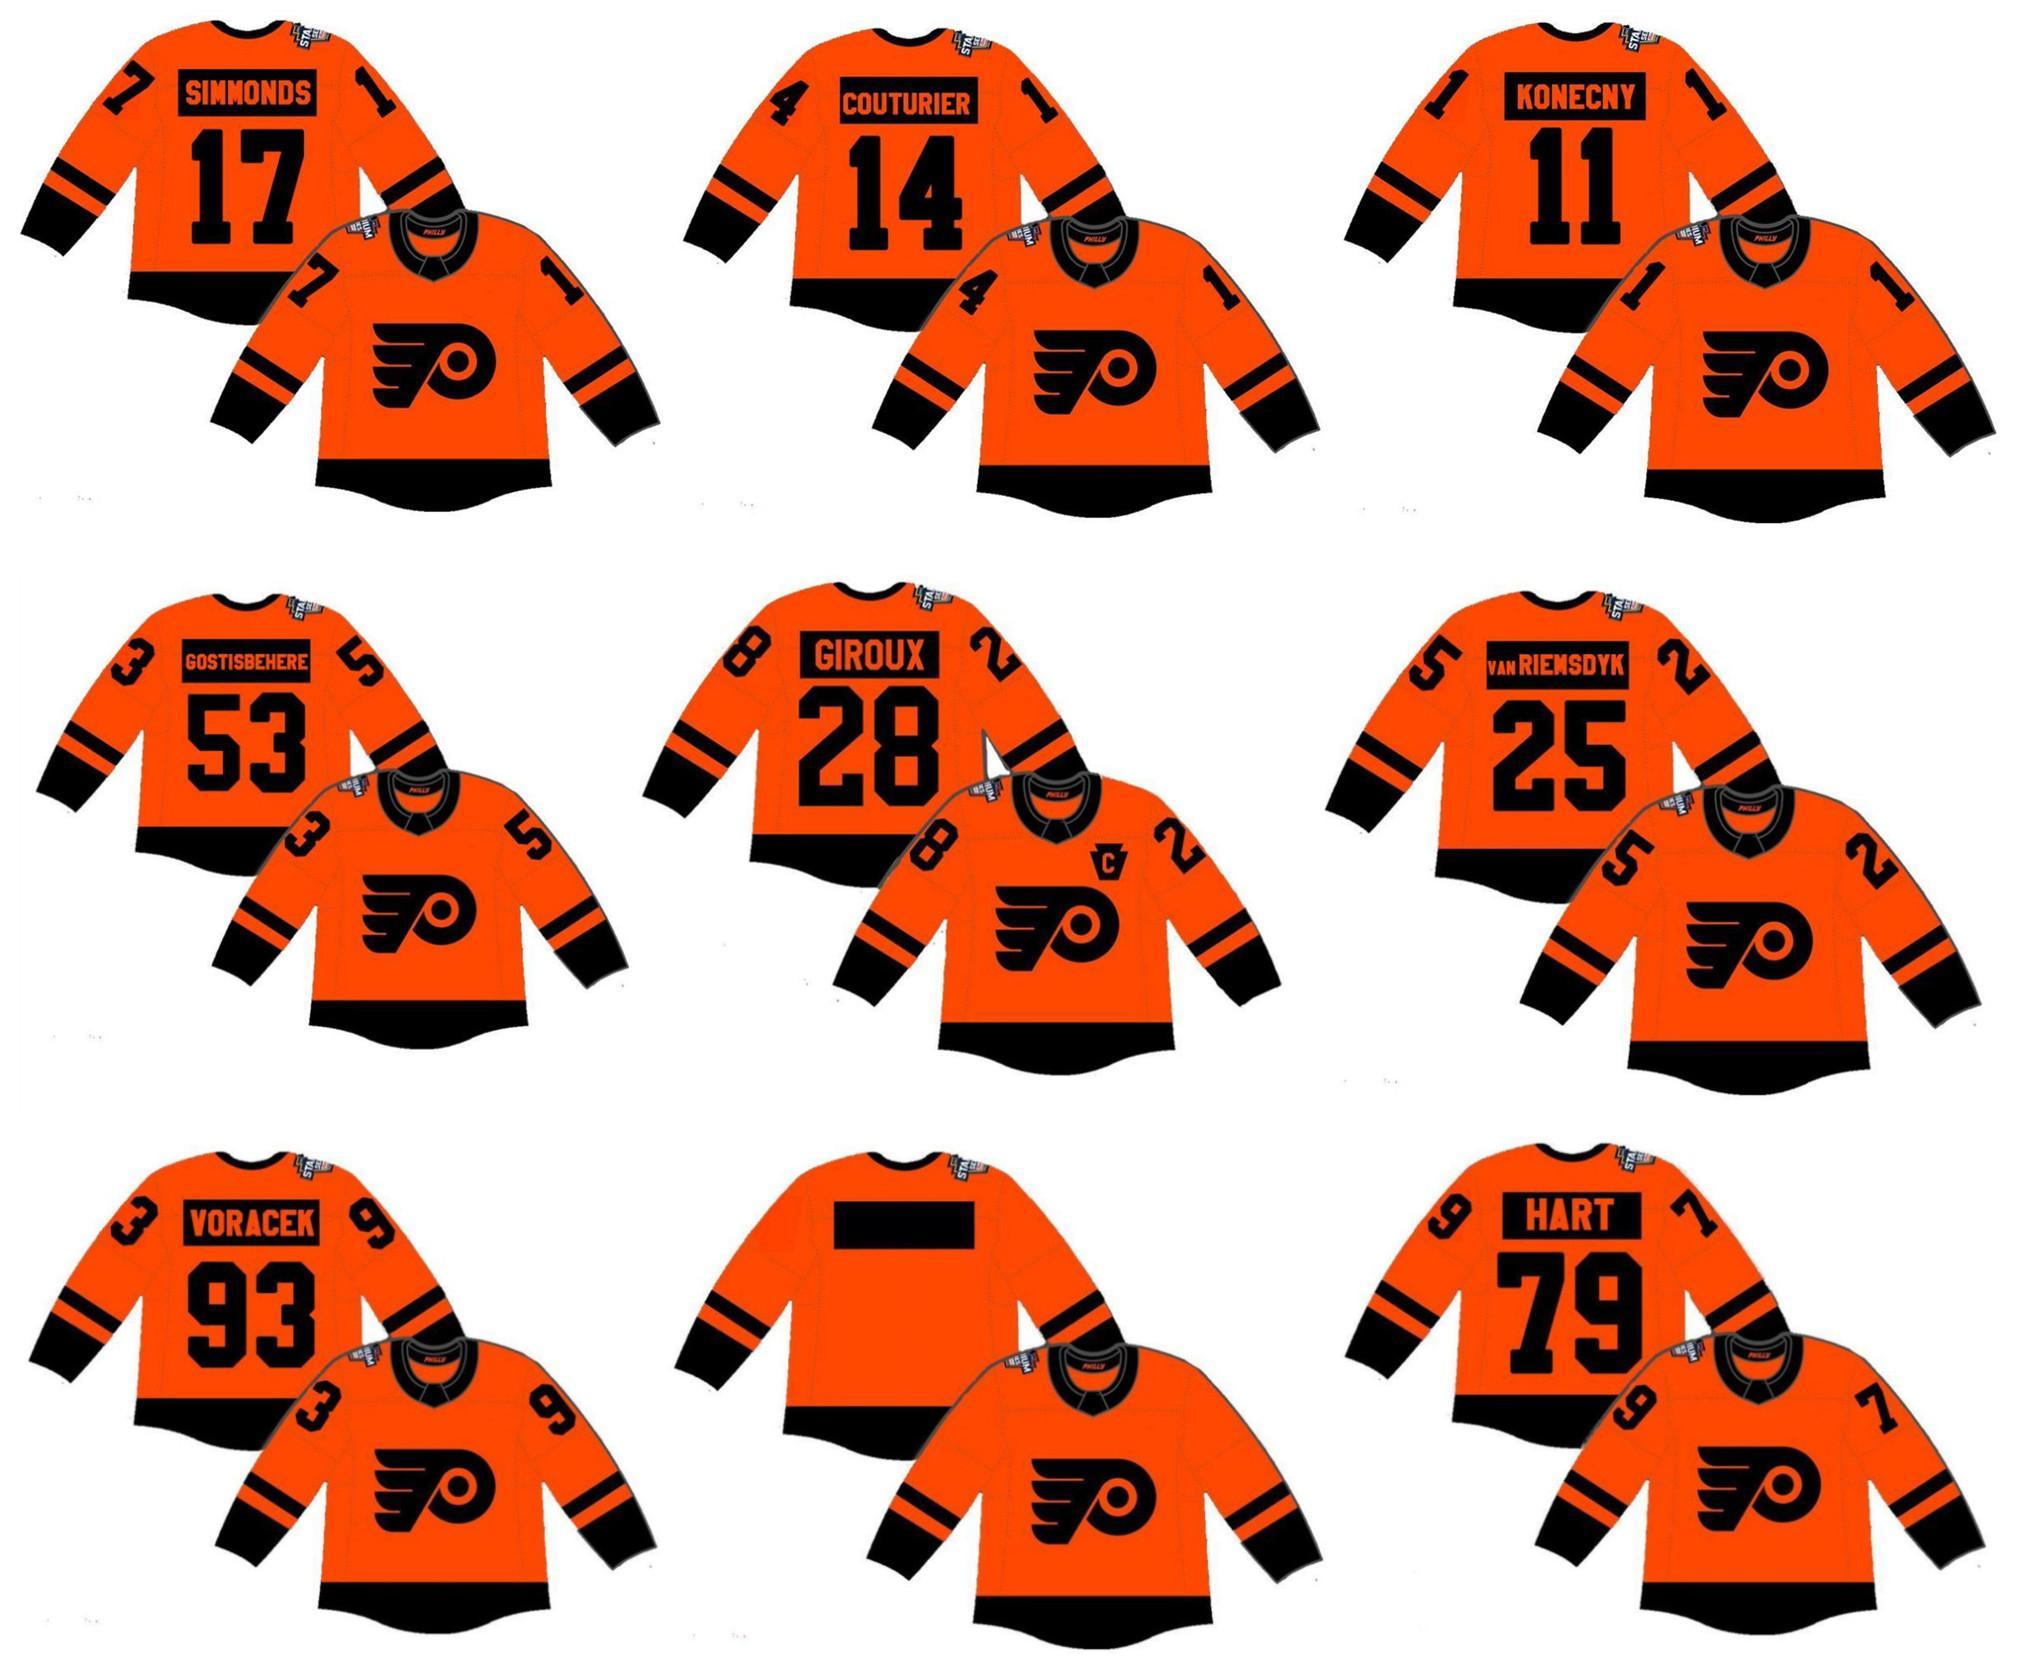 2019 Stadium Series Philadelphia Flyers Jersey 79 Carter Hart 19 Nolan  Patrick Wayne Simmonds Claude Giroux Shayne Gostisbehere Voracek Wholesale  Hockey ... 2e572b97c